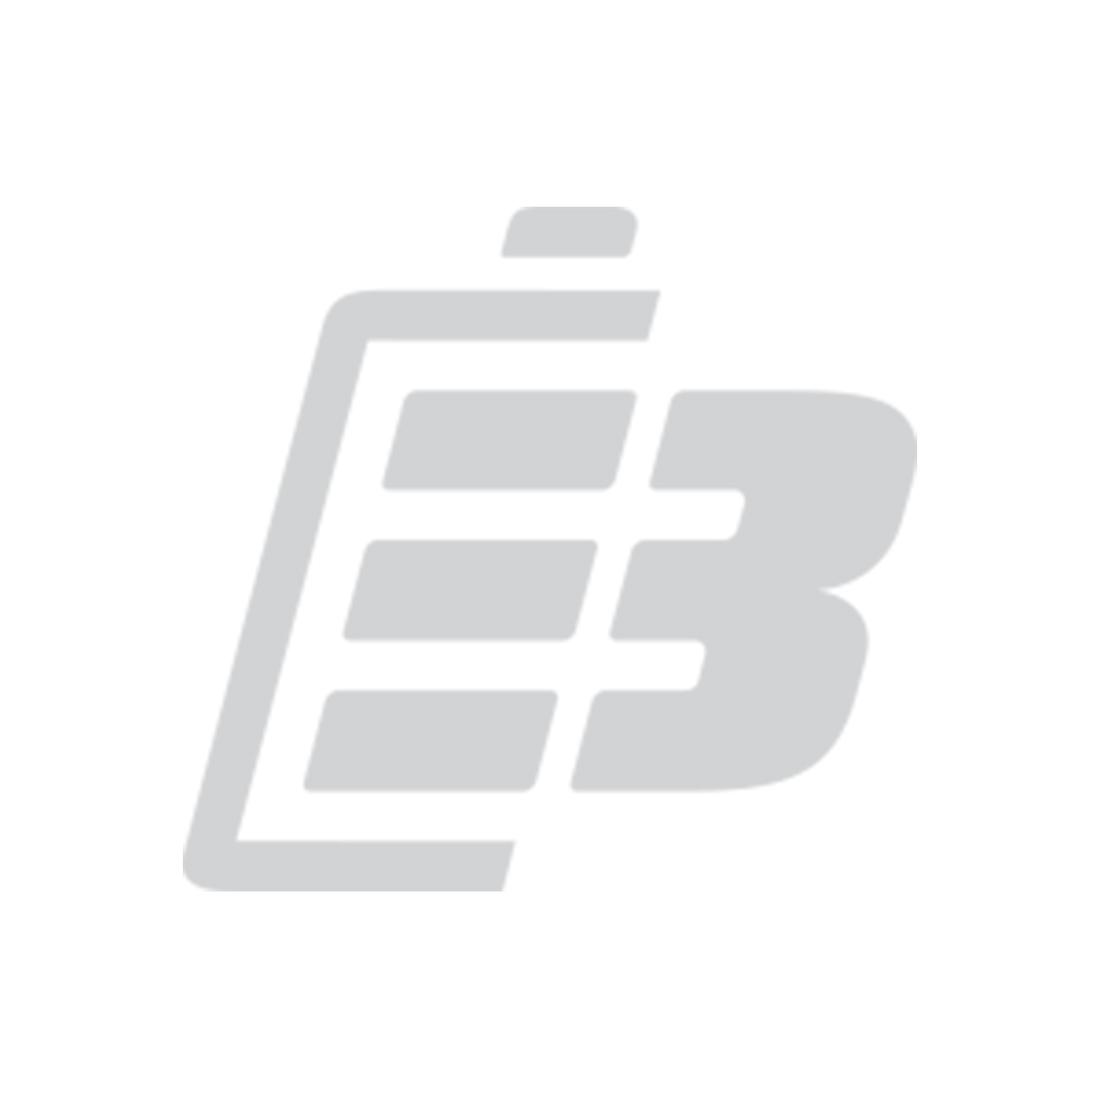 Energizer CRP2 6V 223 Lithium Battery